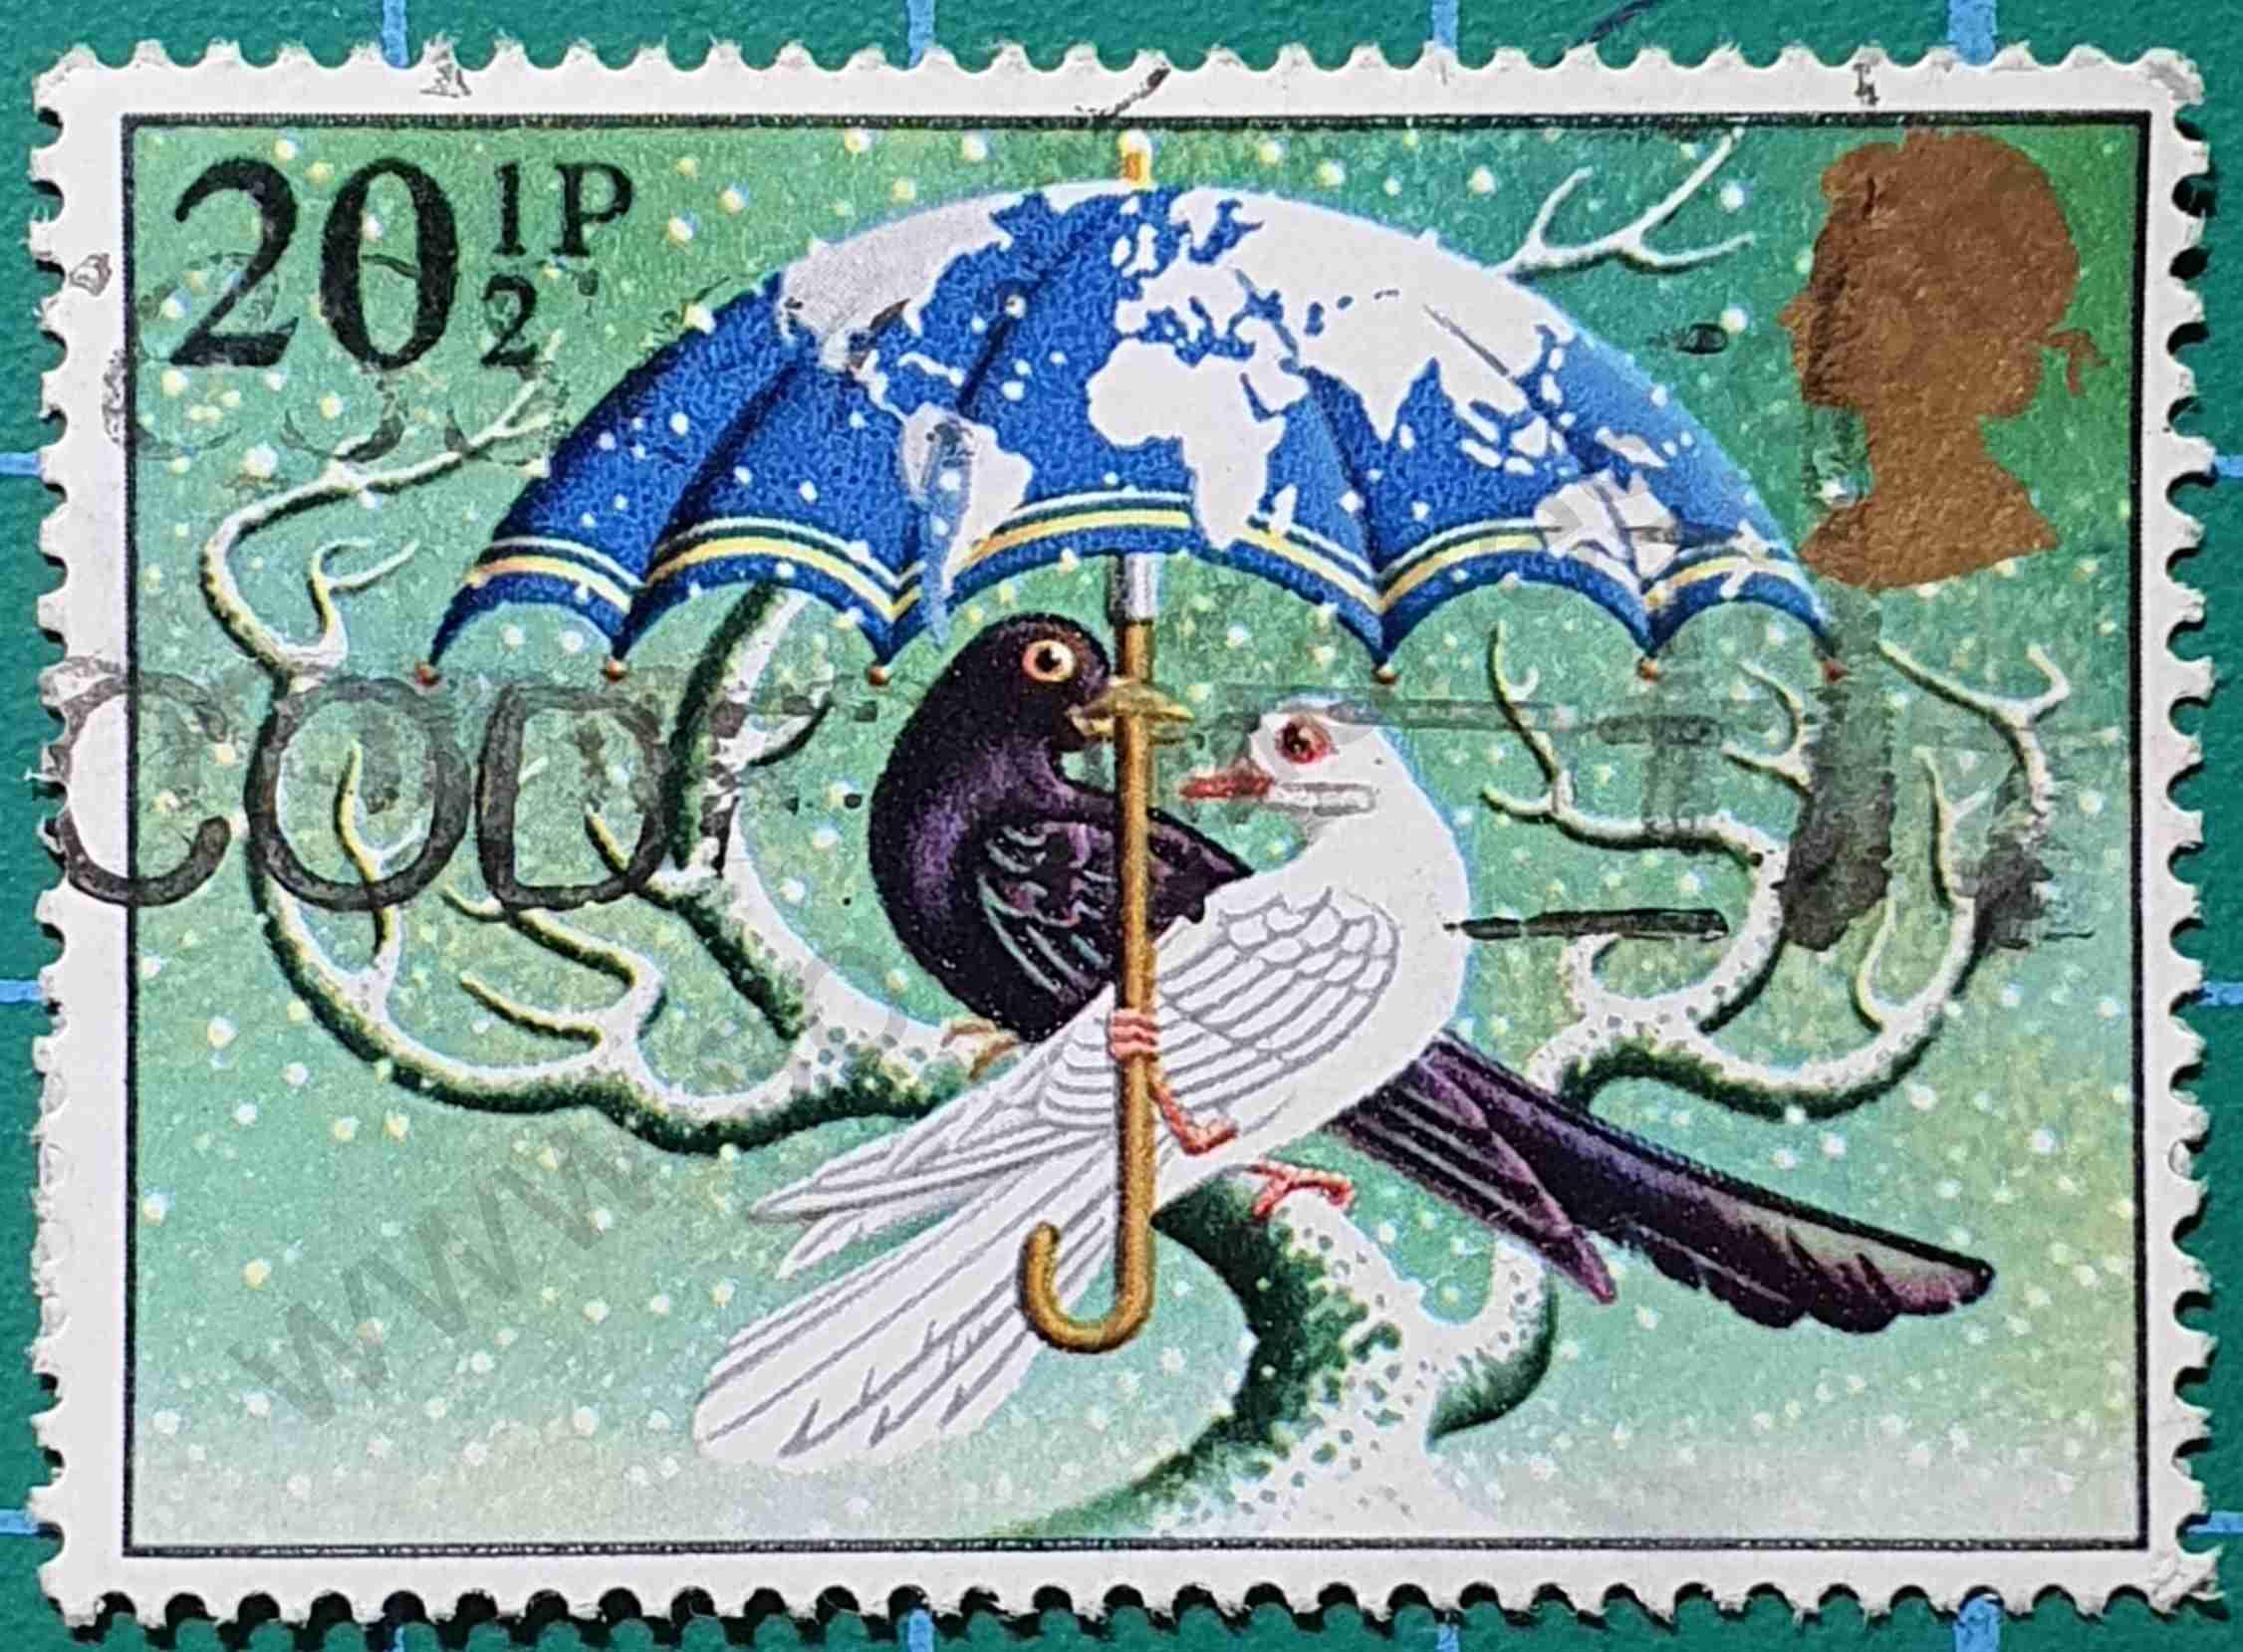 Palomas Blanca y Negra - Sello Reino Unido 1984